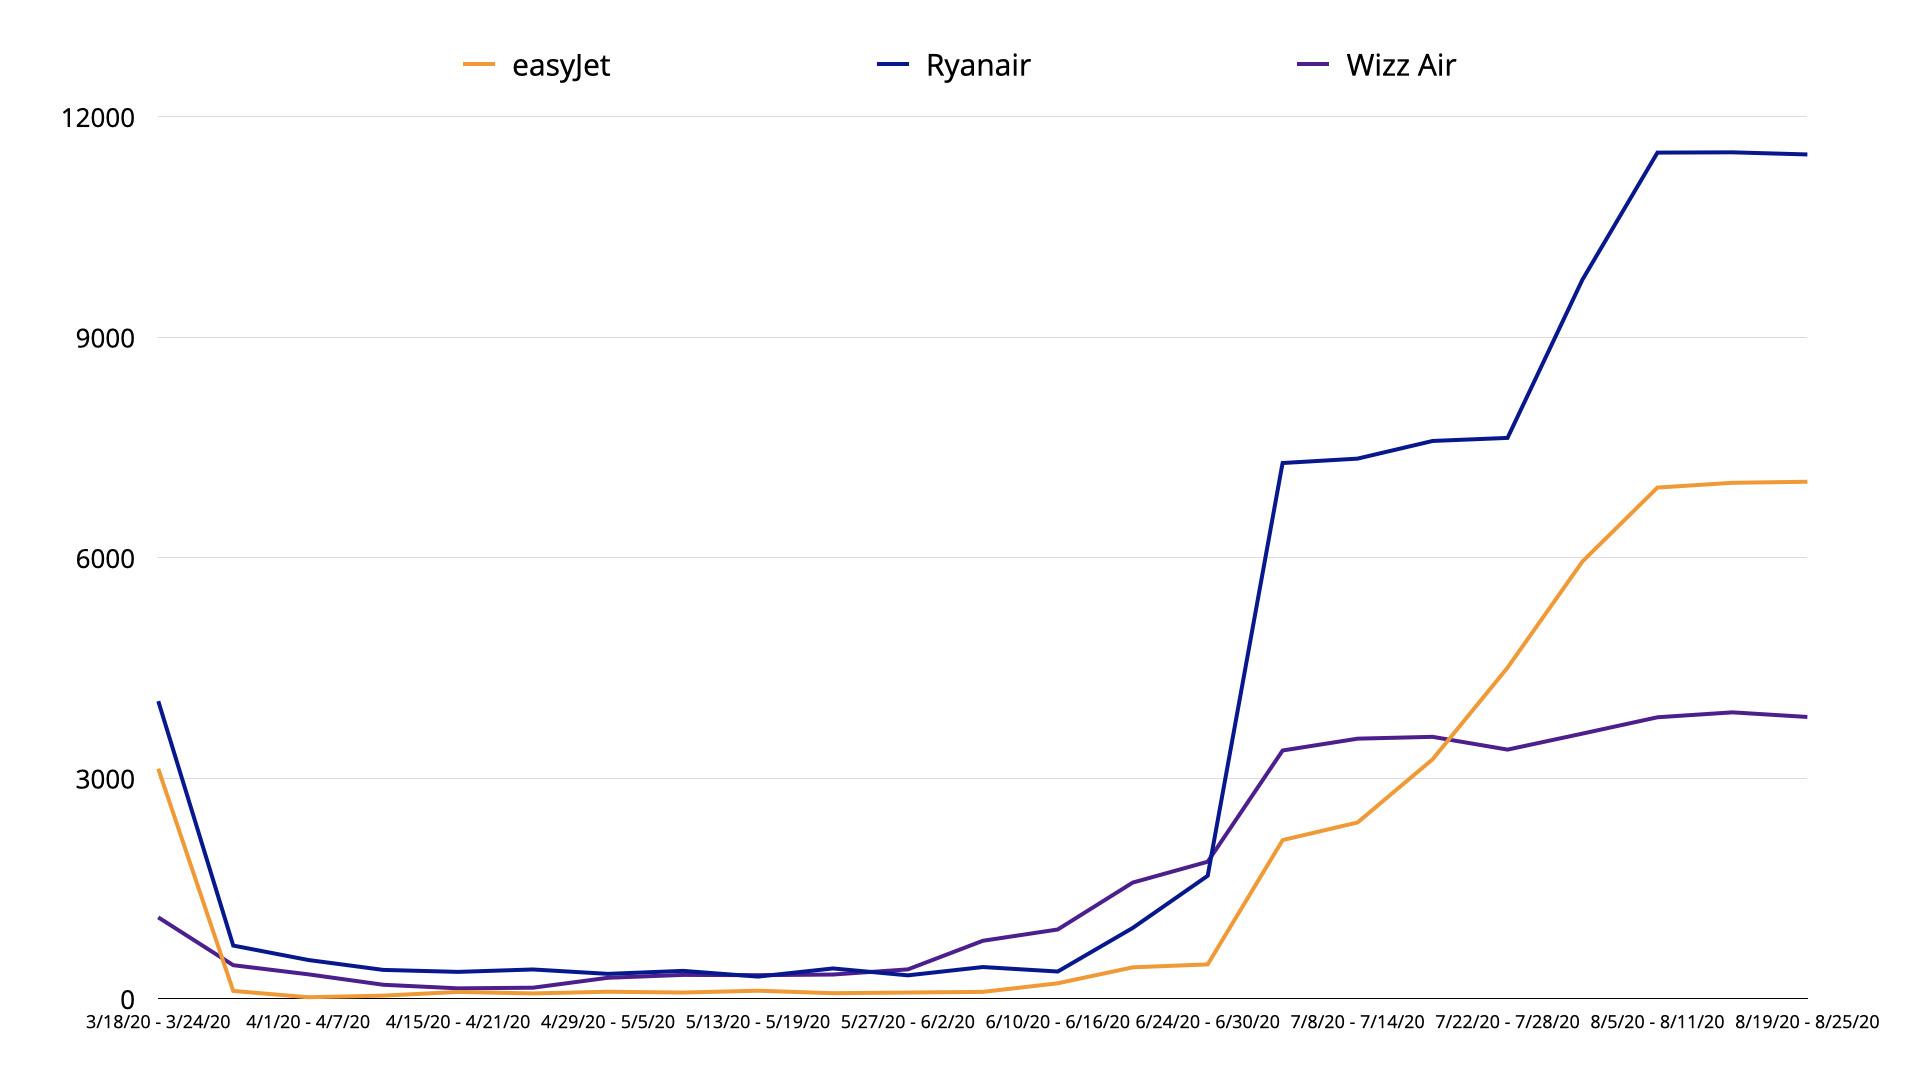 easyJet-Ryanair-Wizz Air March-August 2020